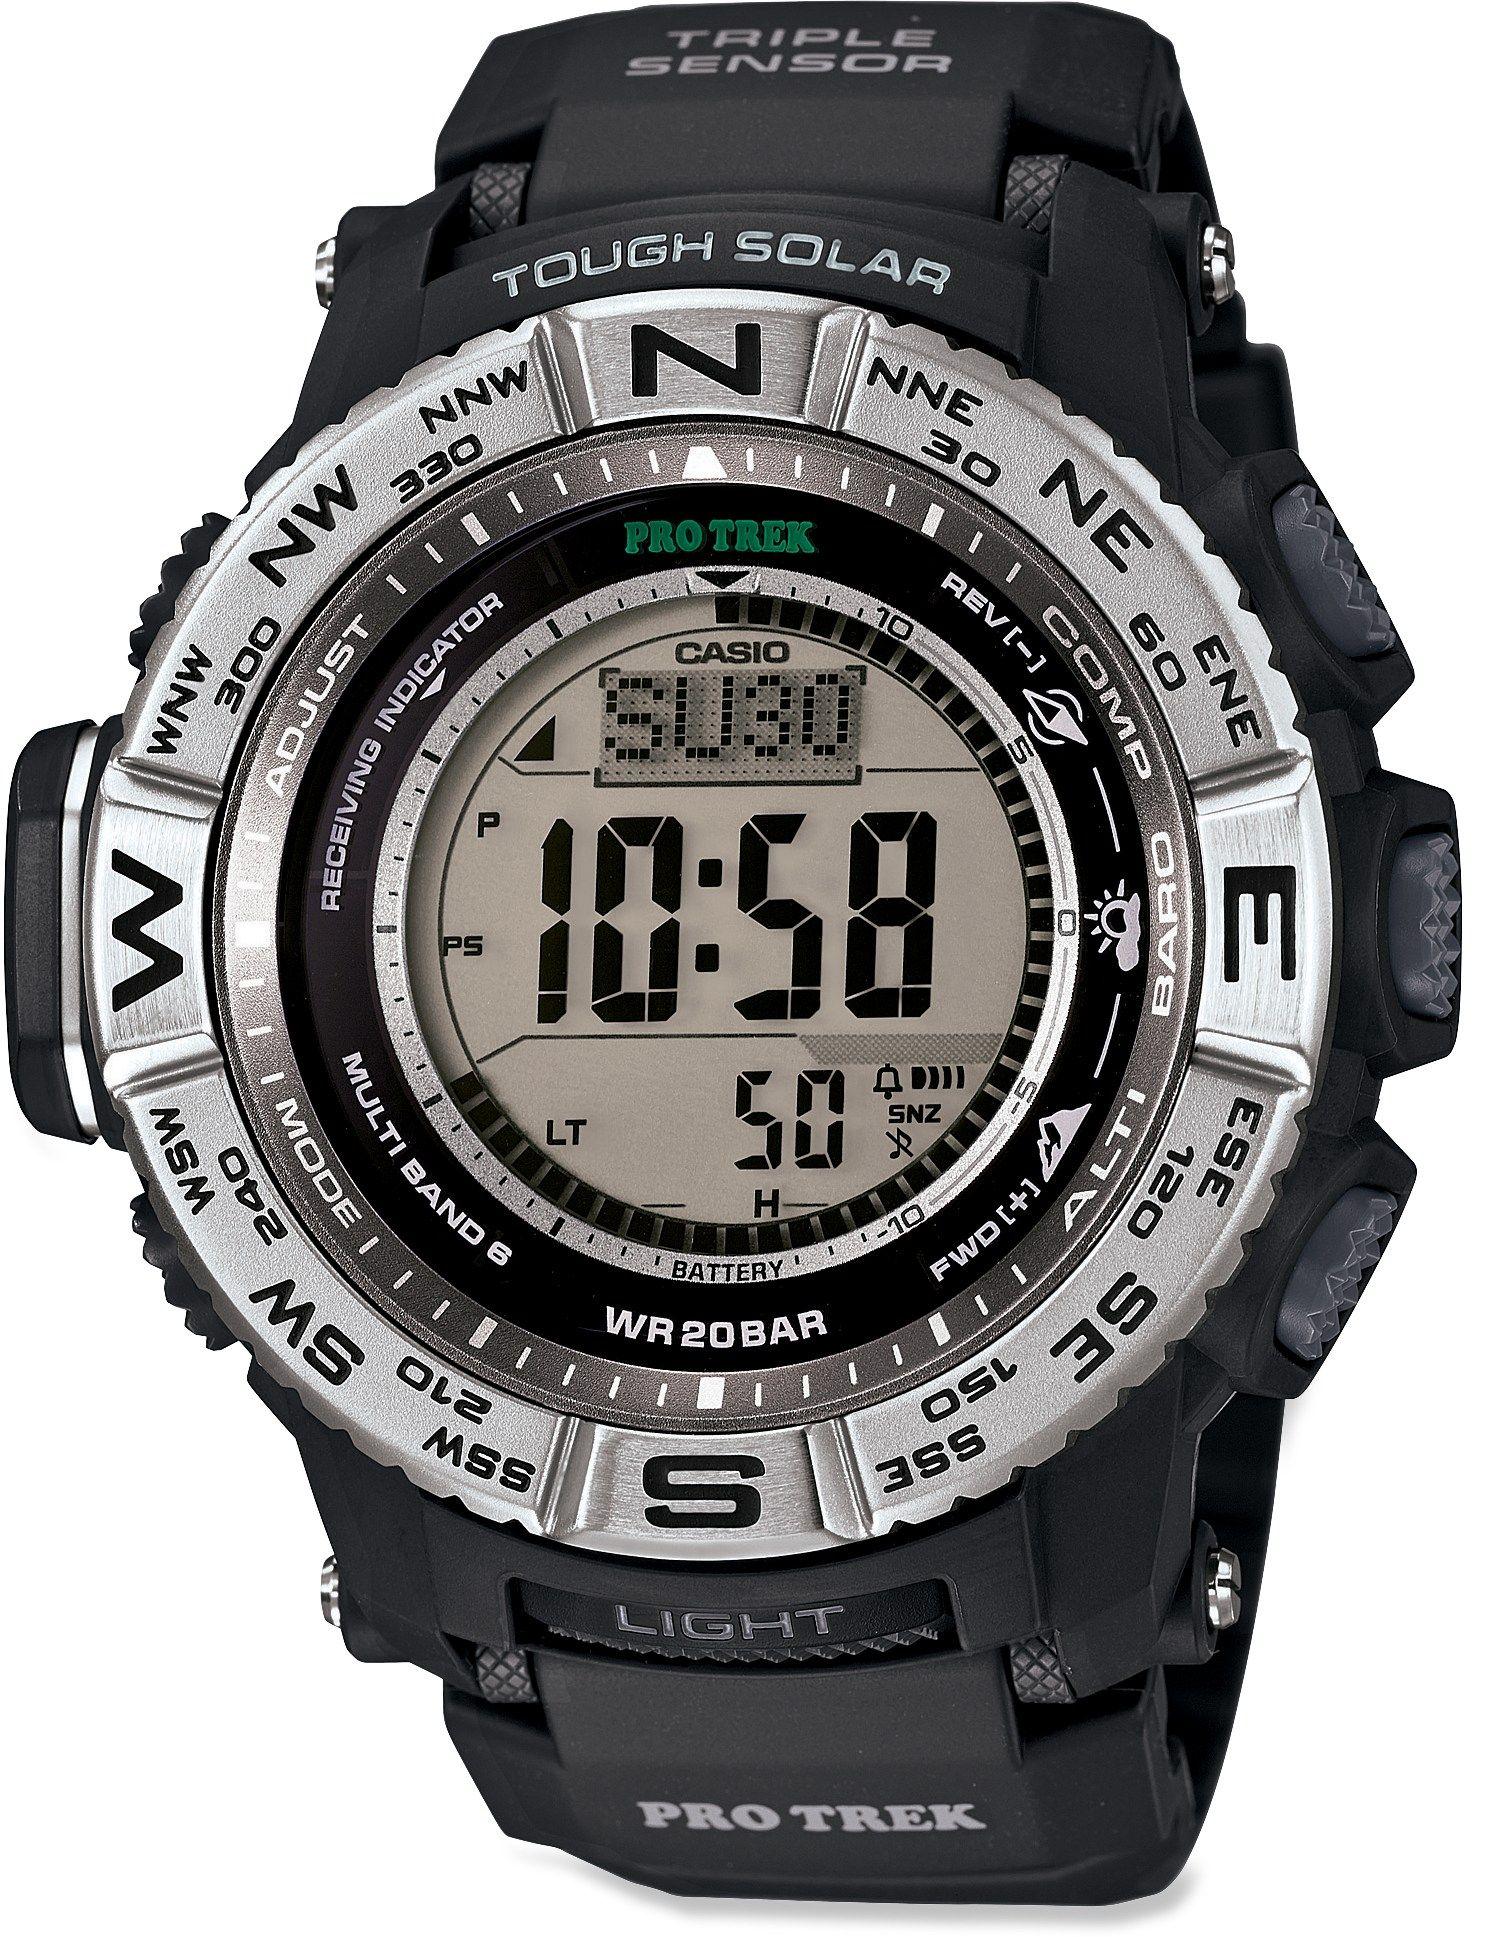 a3db341bf66c Casio Protrek Prw3500-1 Multifunction Watch Reloj Watch